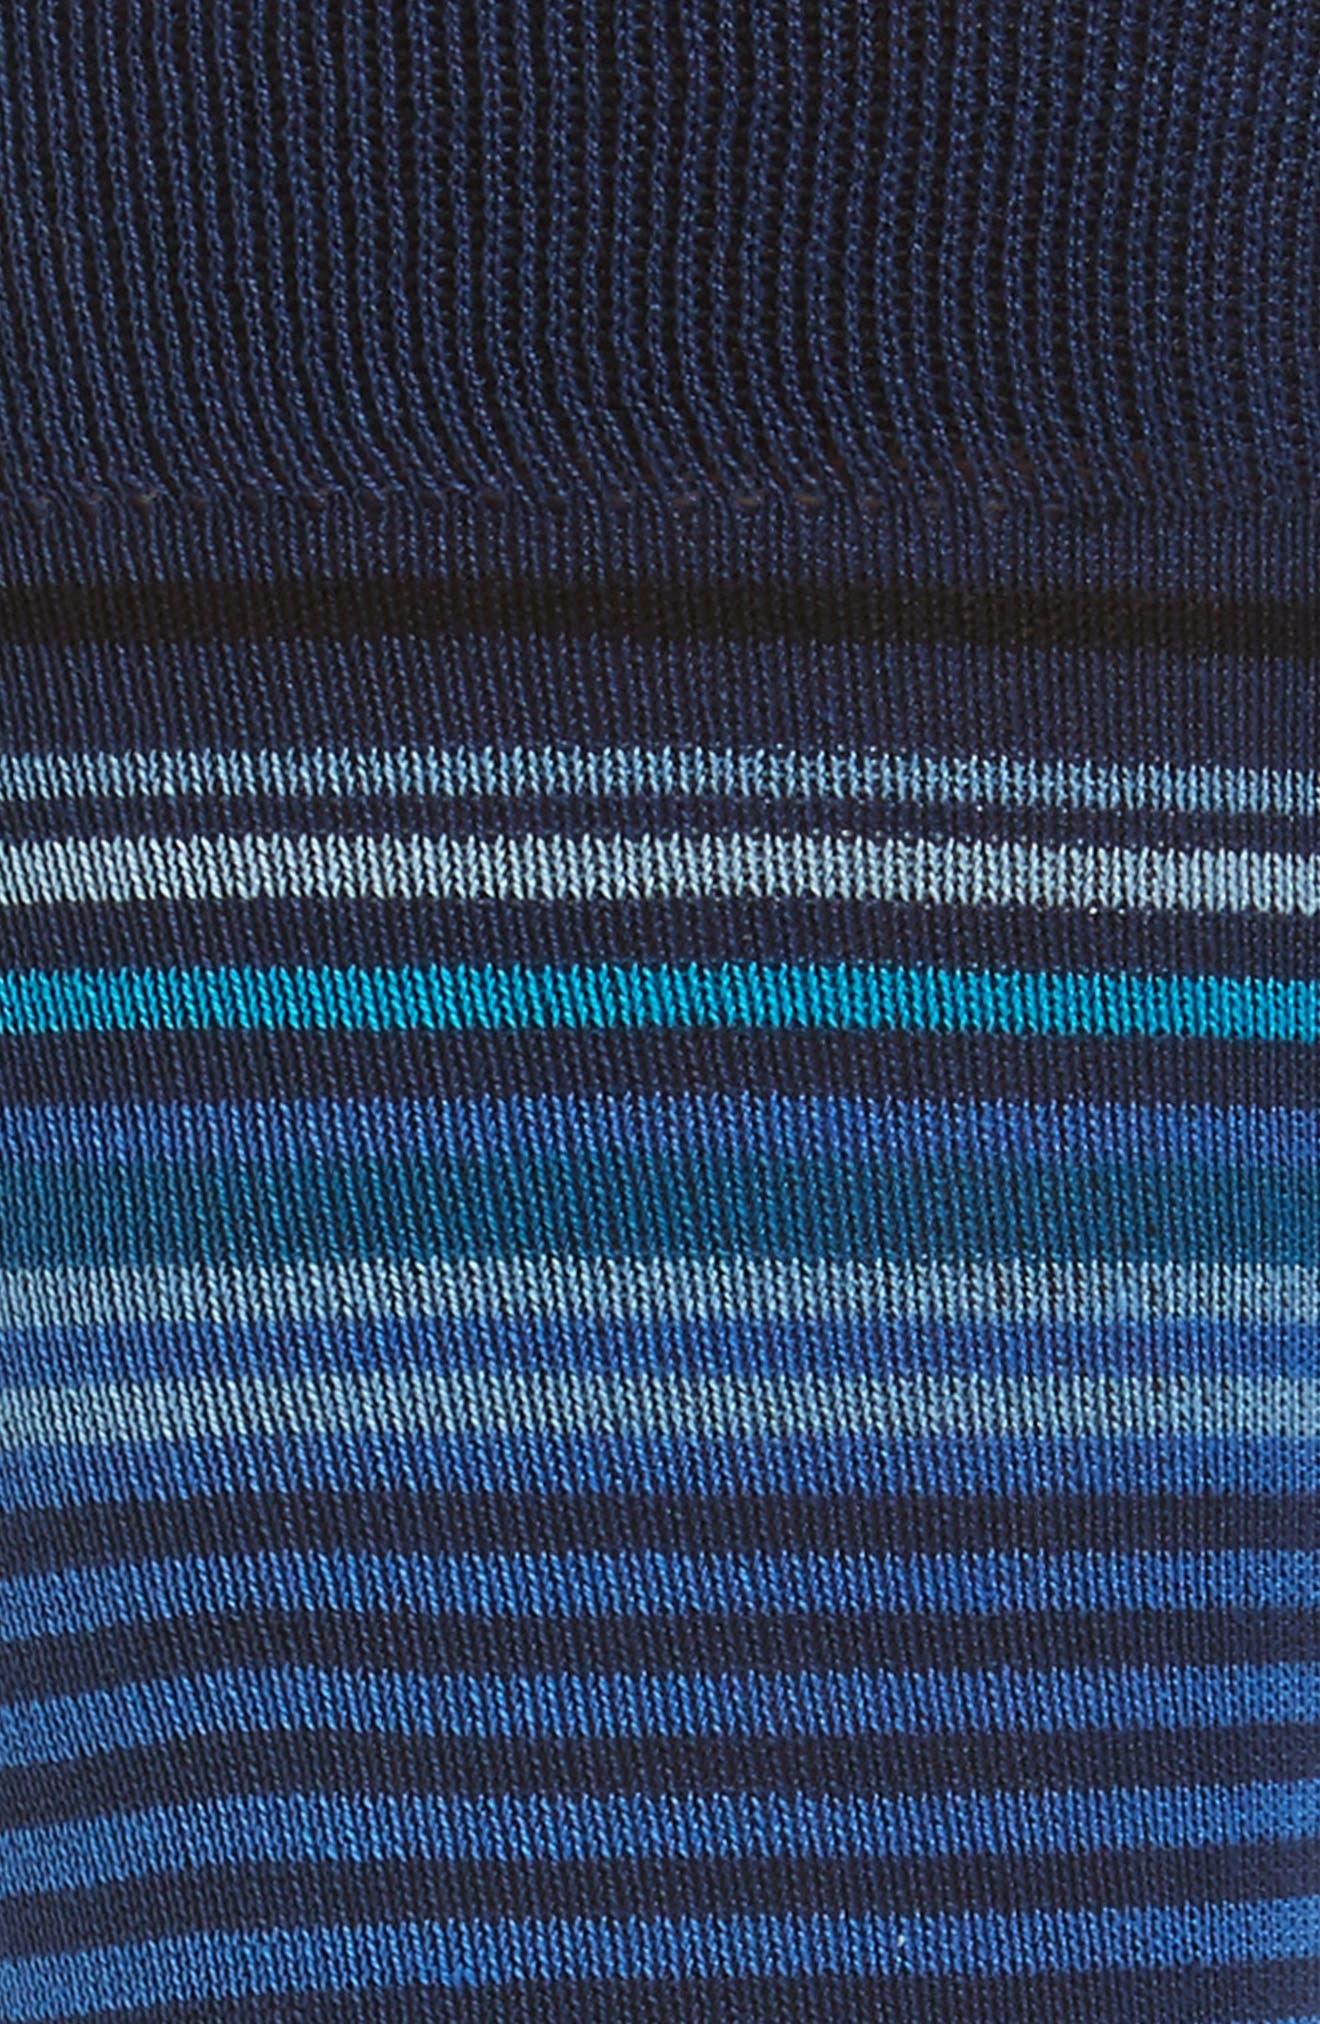 Stripe Crew Socks,                             Alternate thumbnail 2, color,                             Classic Blue